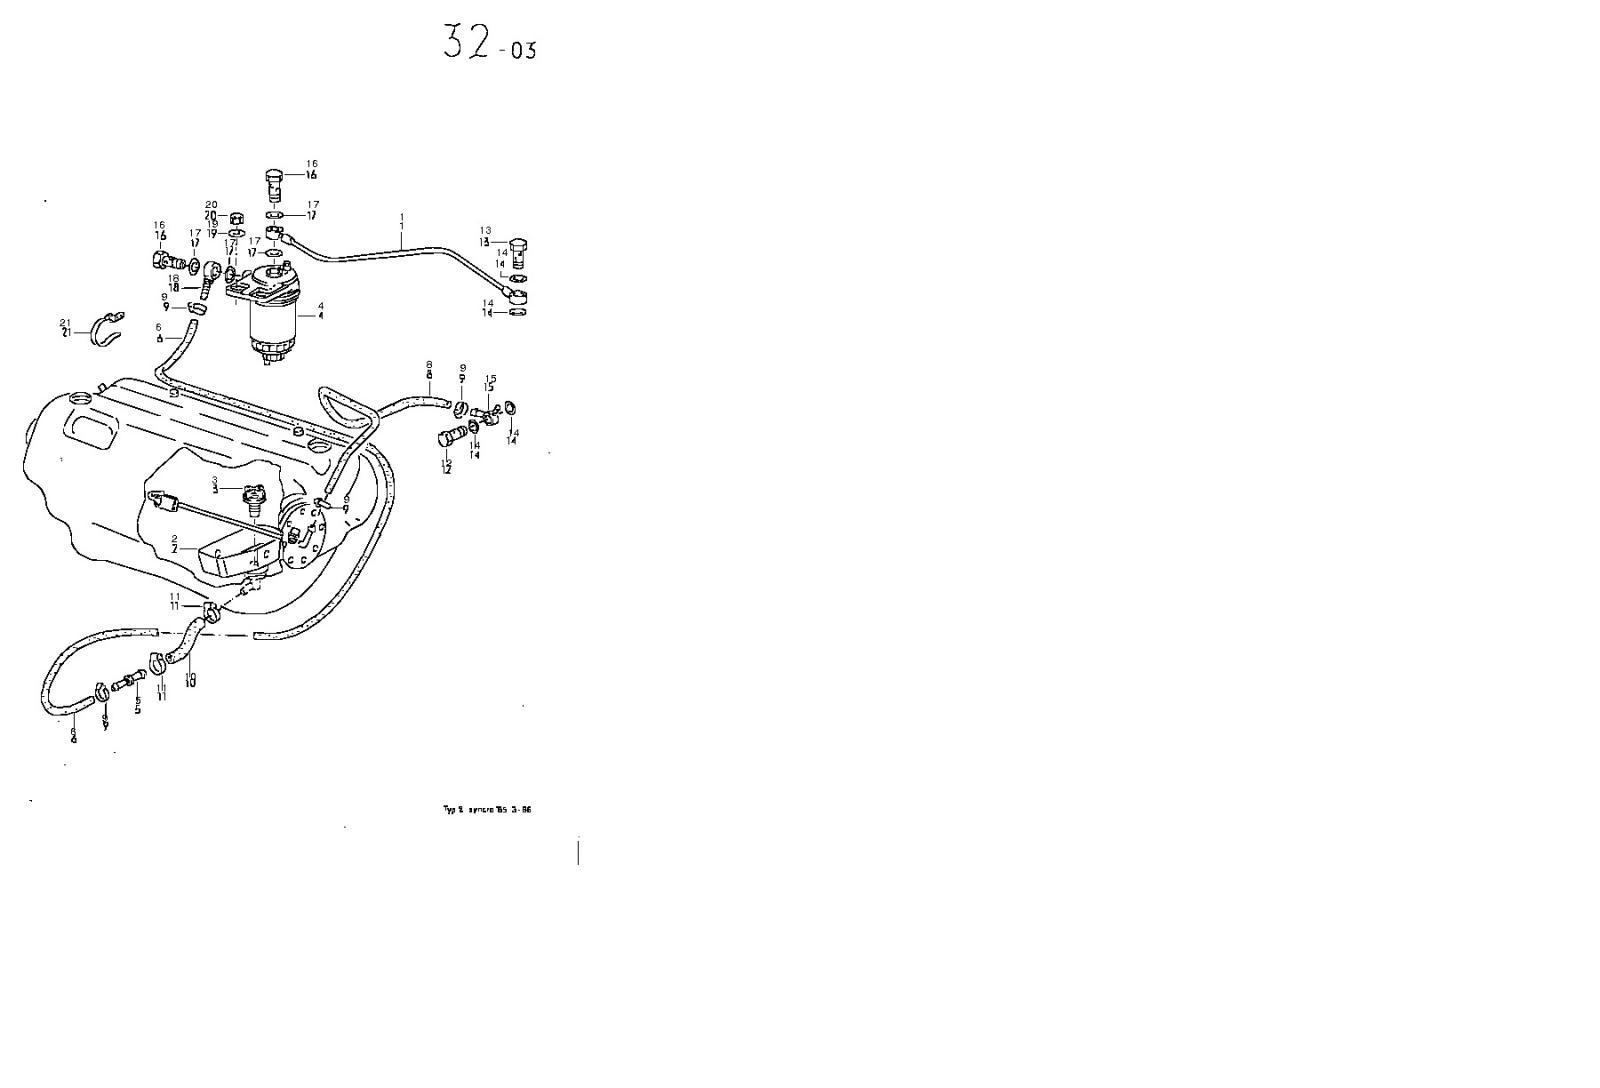 Syncro Diesel Fuel Tank Schematic